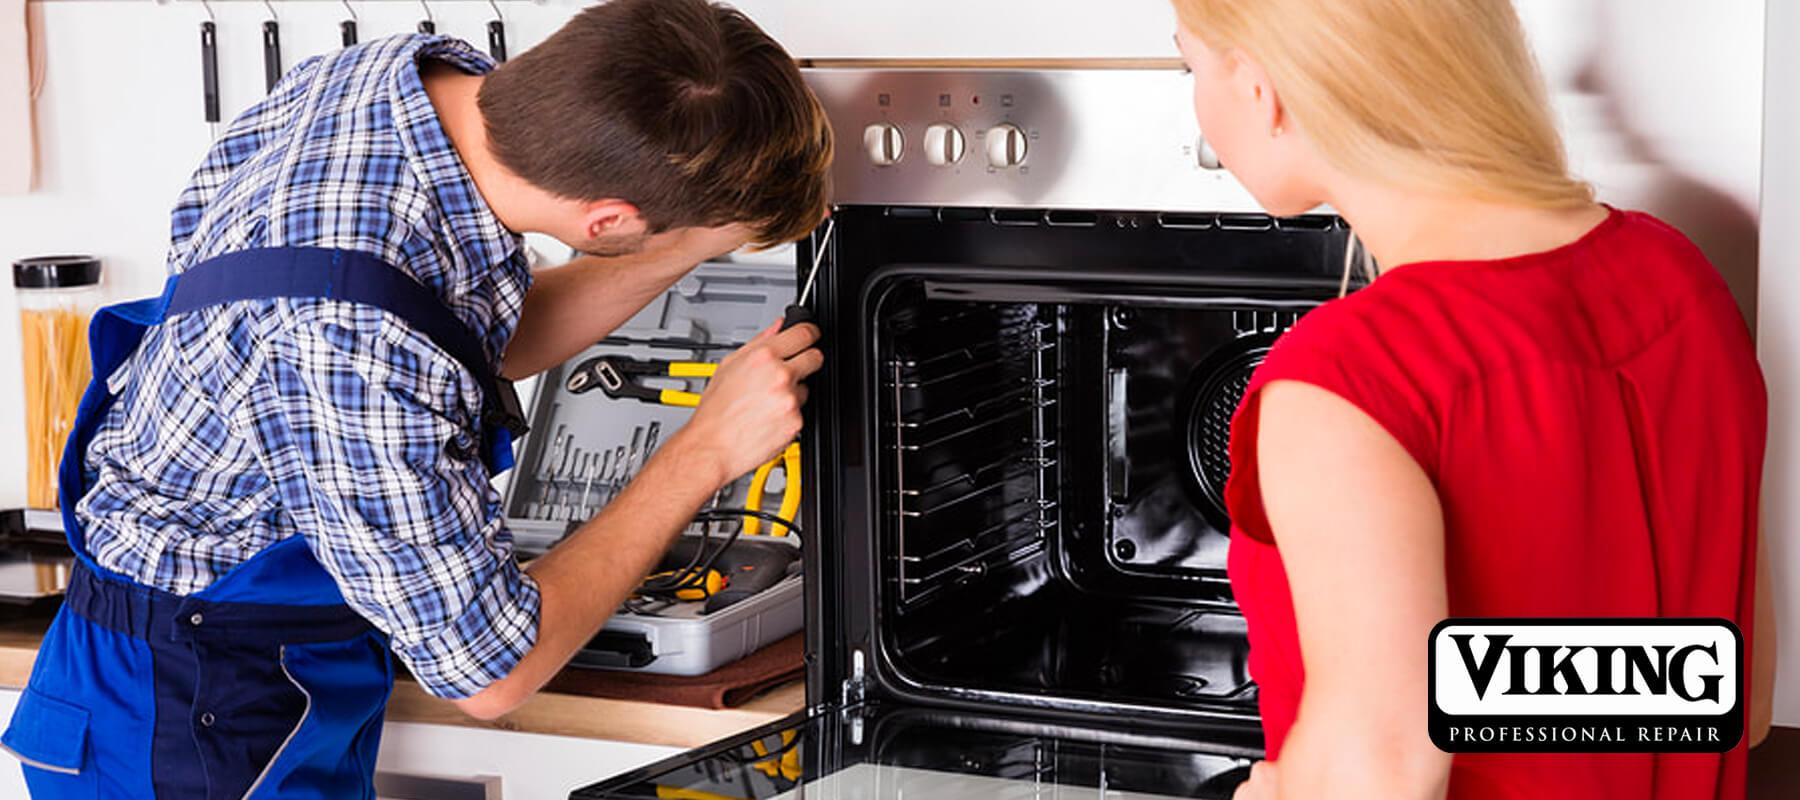 Authorized Viking Appliance Repair Service Irvine | Professional Viking Repair